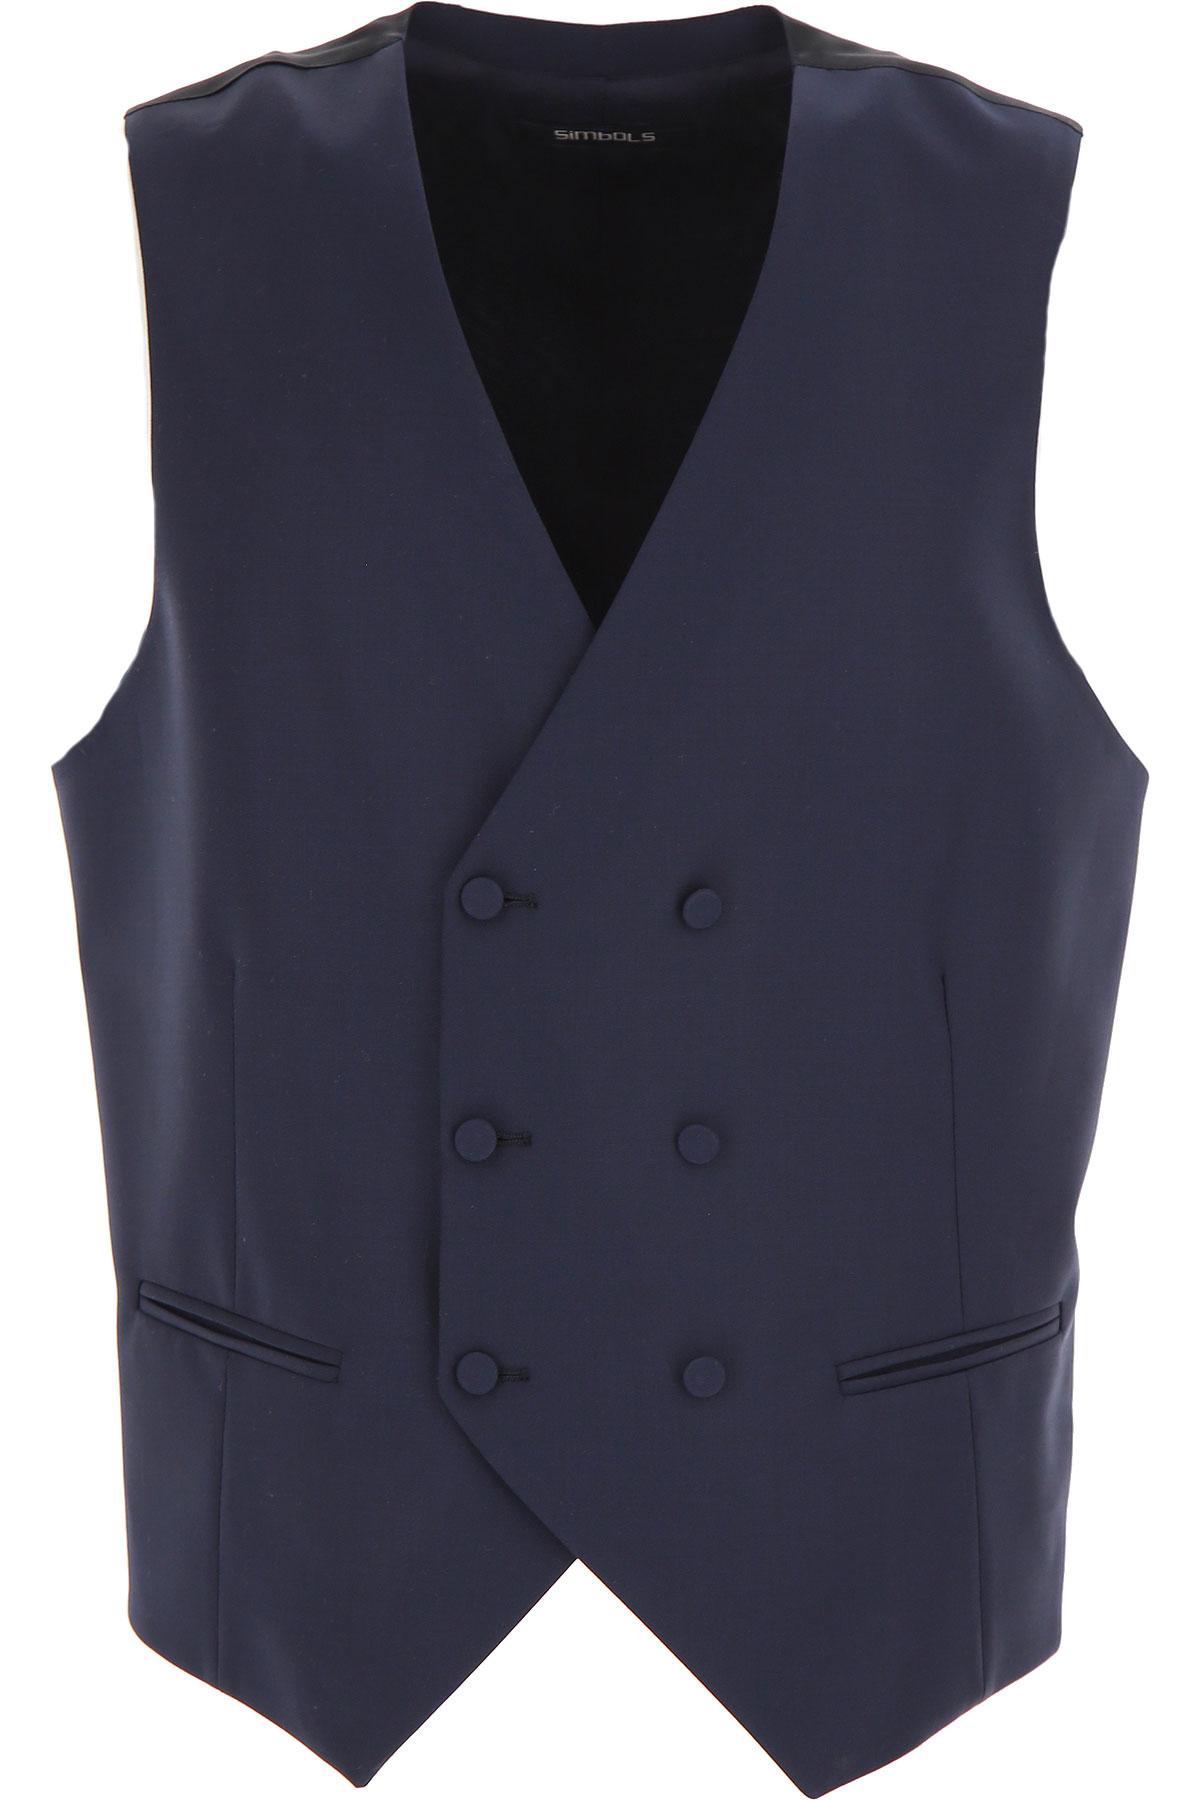 Simbols Mens Clothing, Dark Navy Blue, polyester, 2019, L S XL